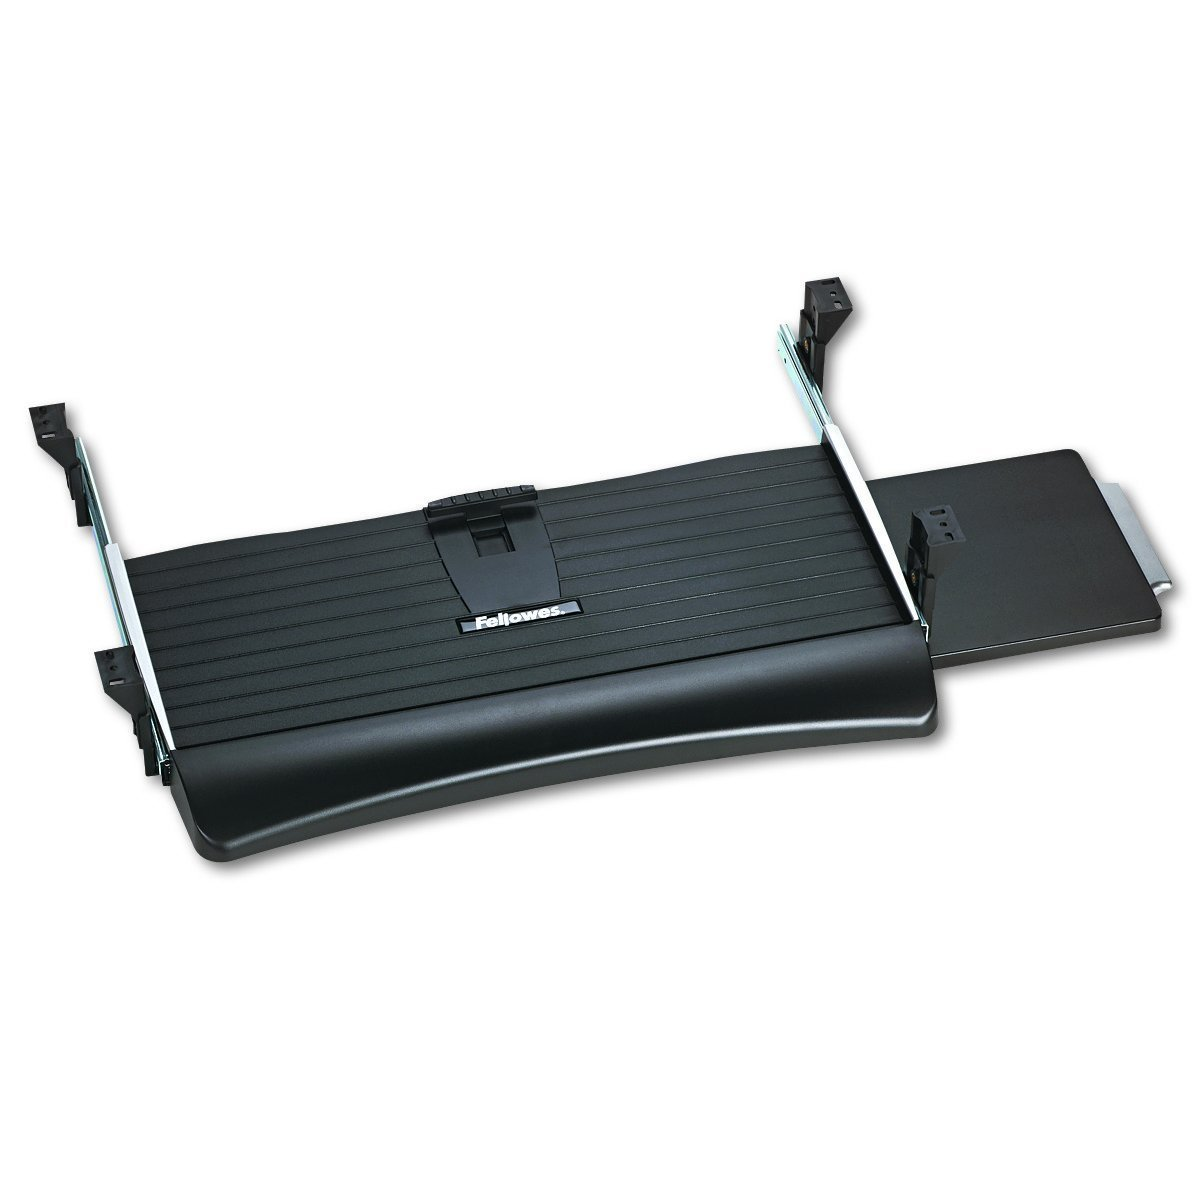 Fellowes Office Suites Underdesk Keyboard Drawer, Black/Silver (9140303) (Pack of 3)